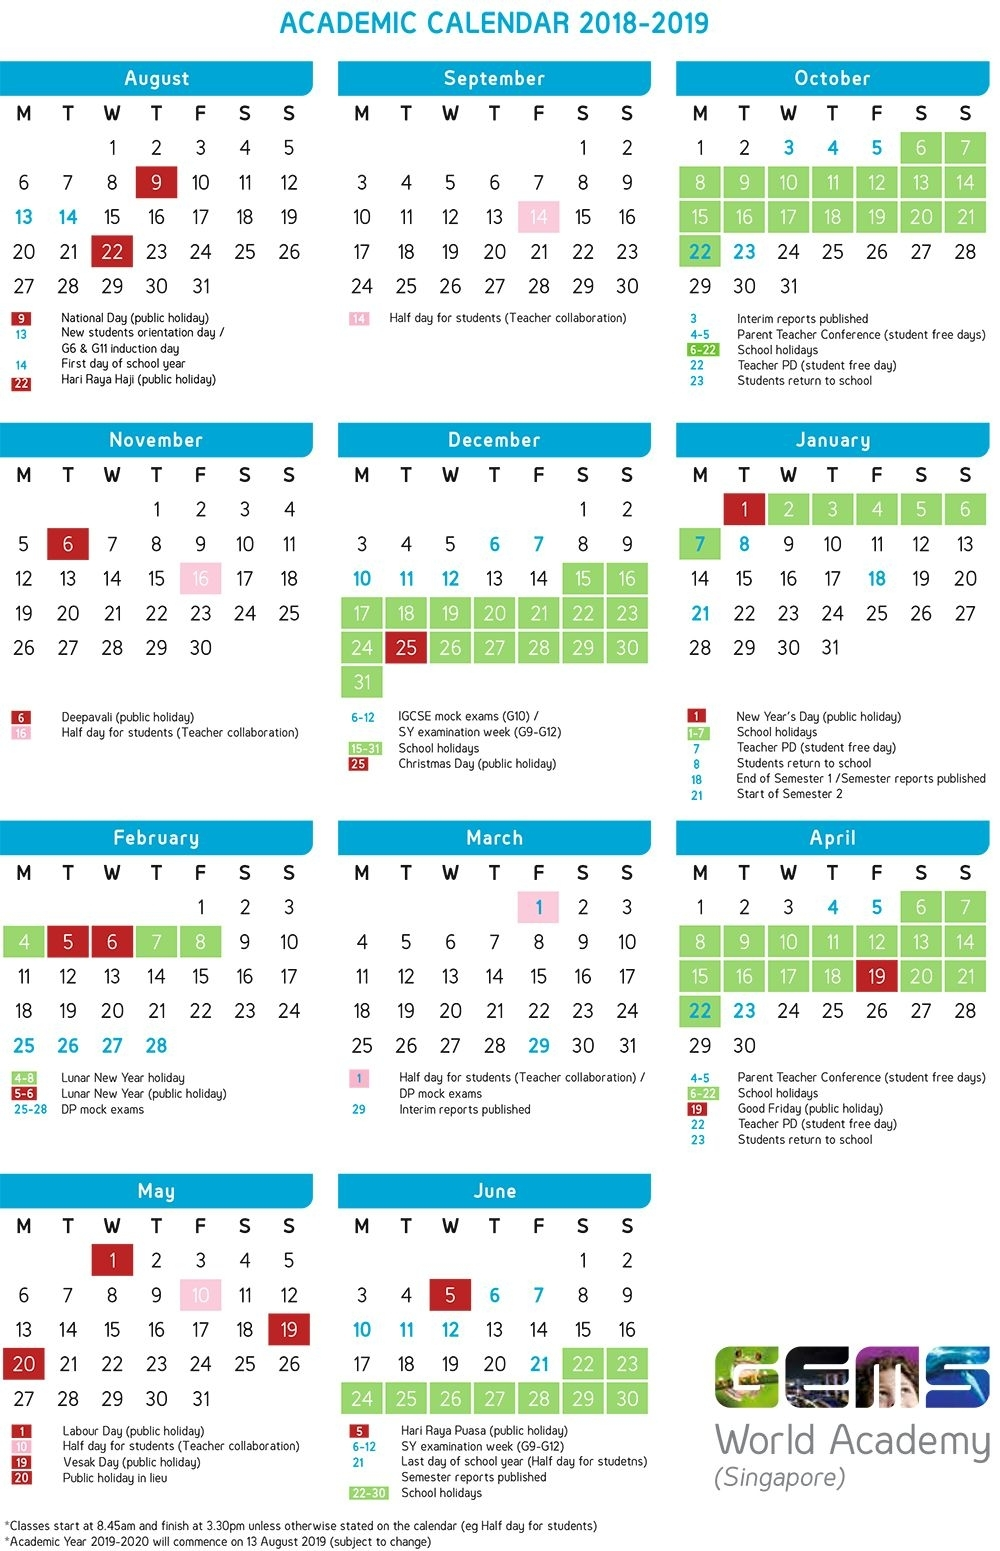 Academic Calendar | Gems World Academy (Singapore) (With